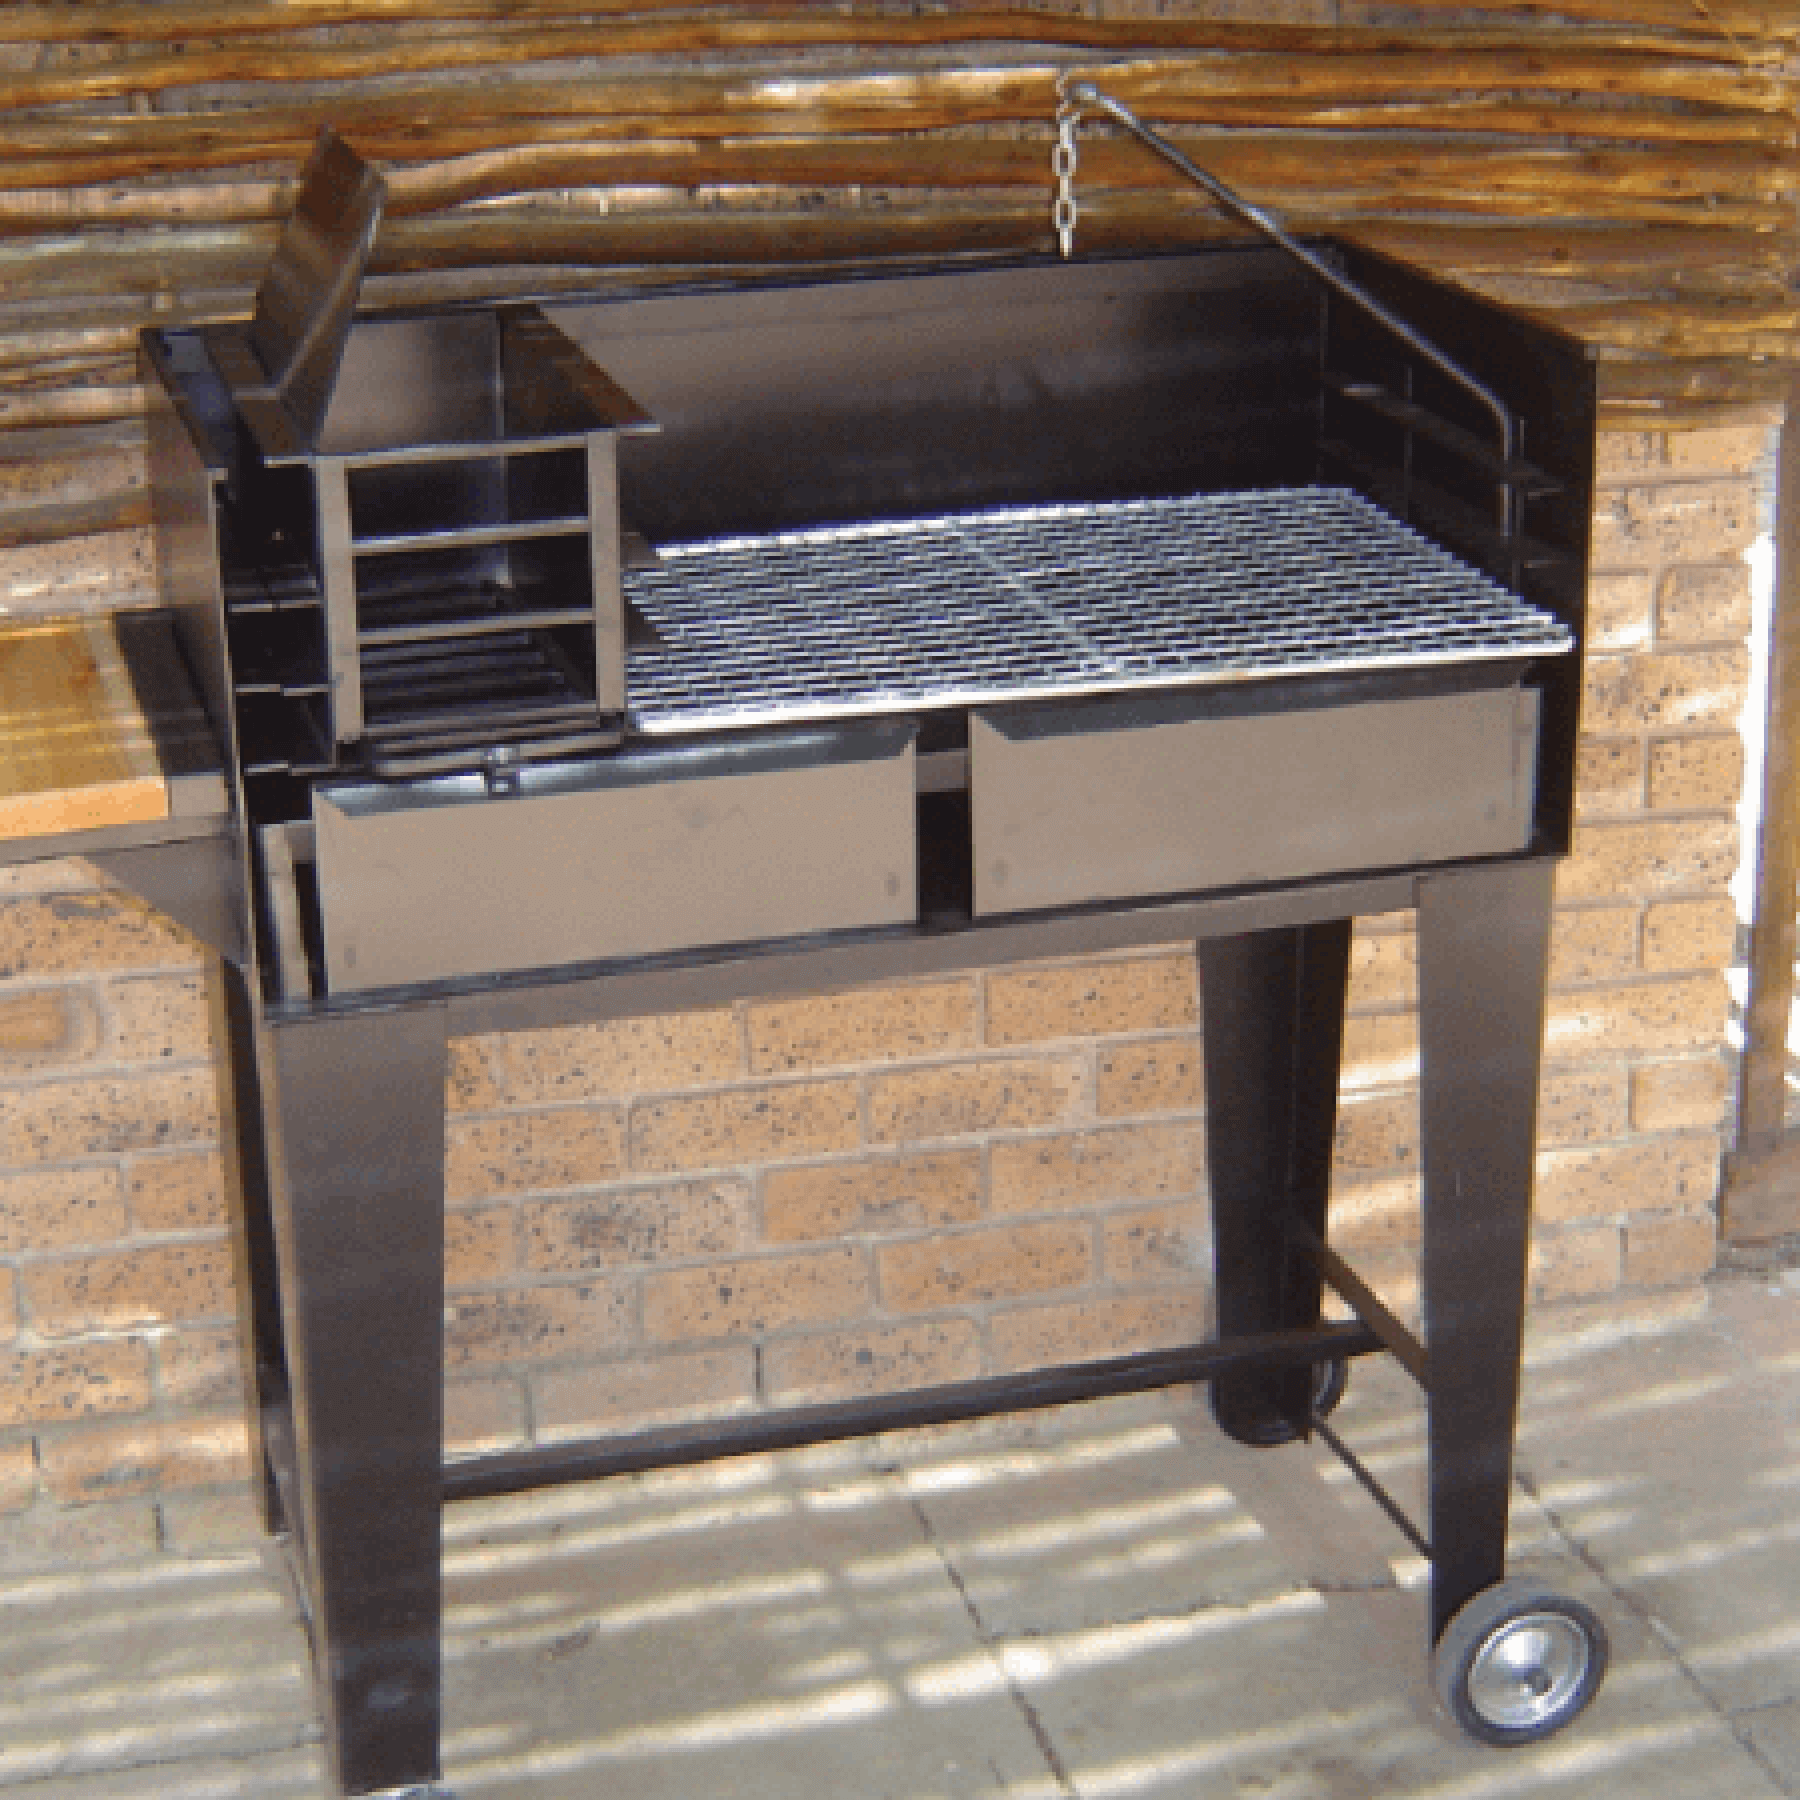 Braais-Freestanding-Mobile-Wood